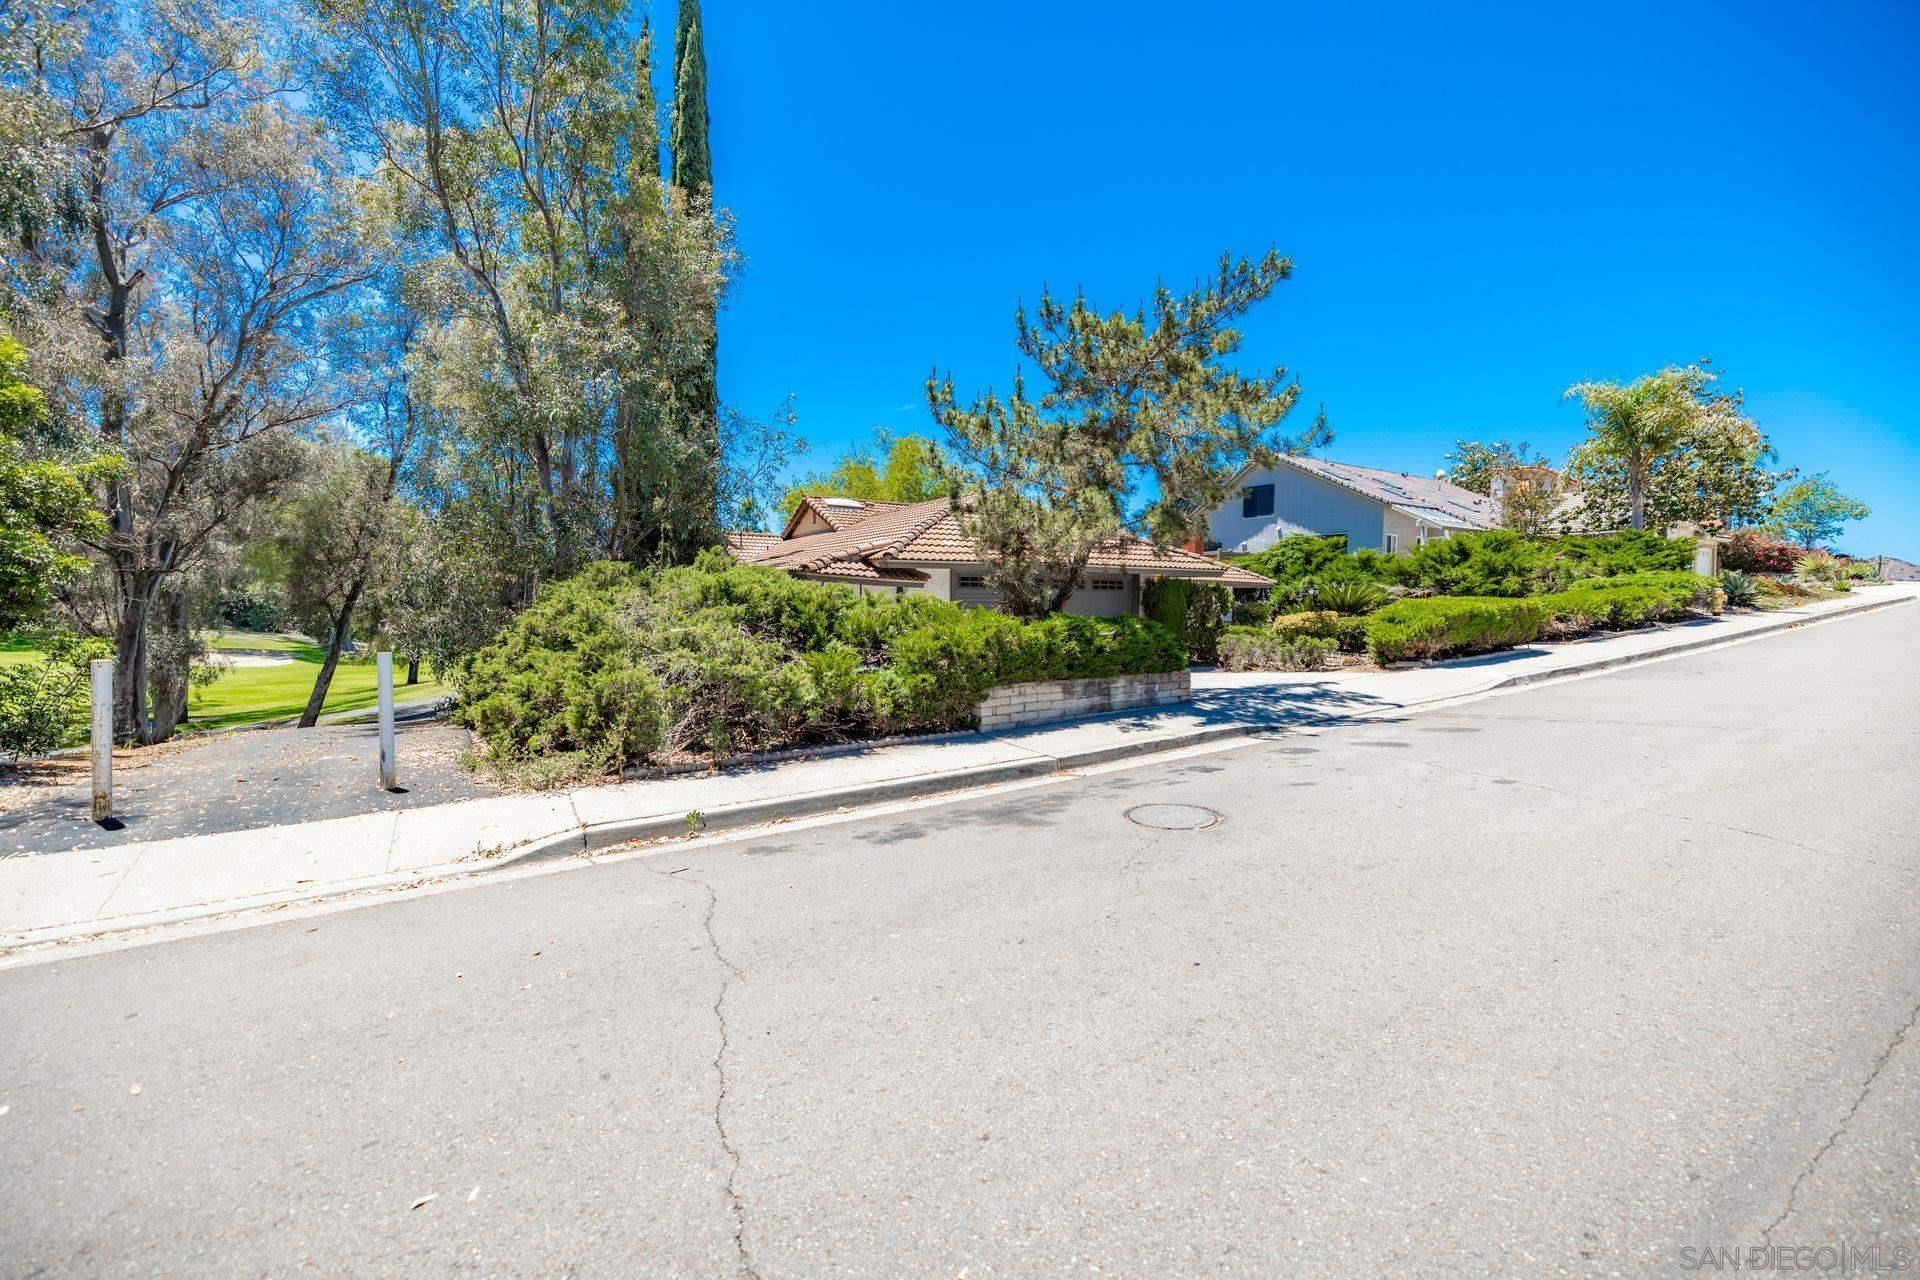 Photo of 17510 Frondoso Dr, San Diego, CA 92128 (MLS # 210016395)